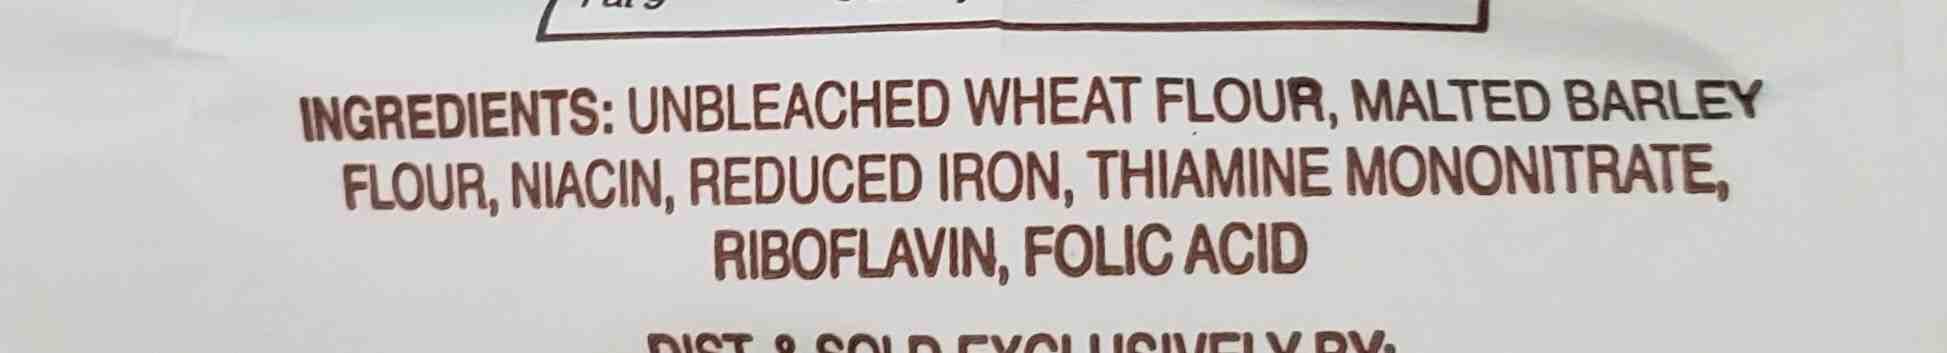 Baker Josef's unbleached all purpose flour - Ingredients